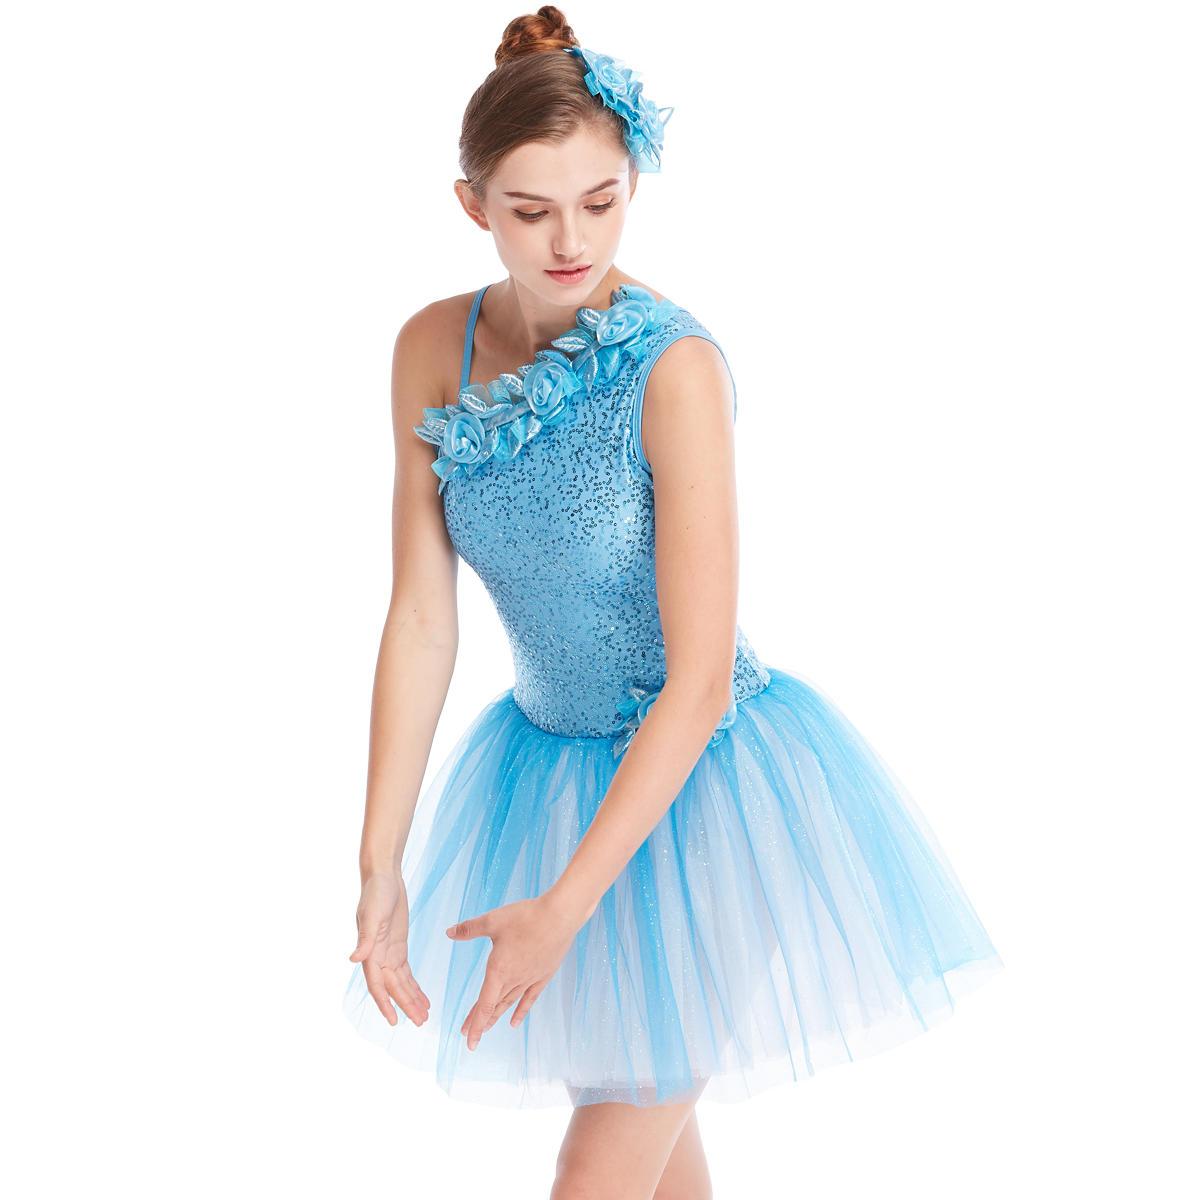 MiDee Tutu  One-Shoulder Floral Neckline Sequined Ballet Dance Leotard Dance Costume